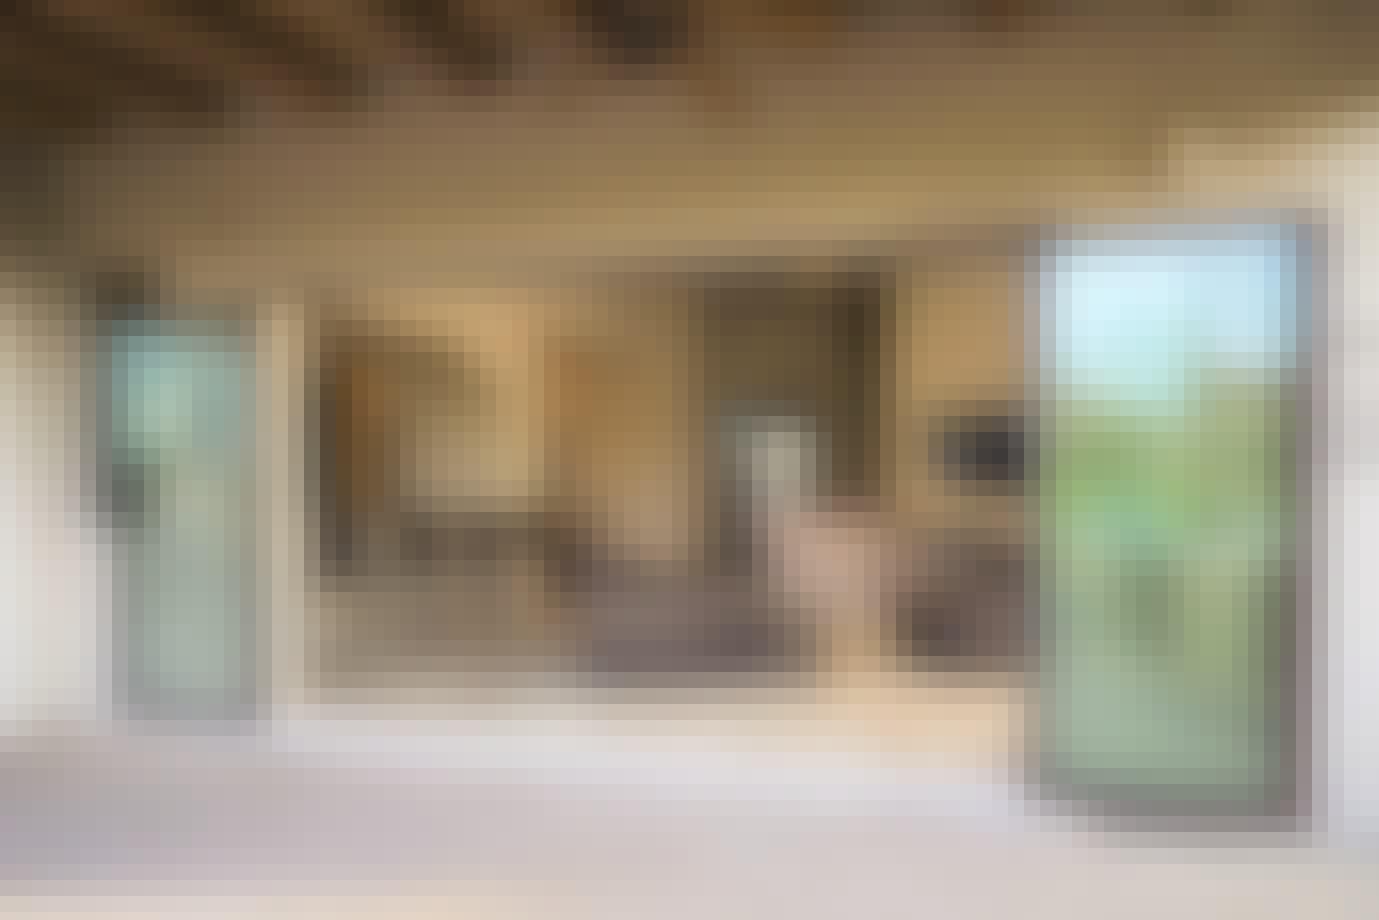 FoldFlat technology for folding patio doors